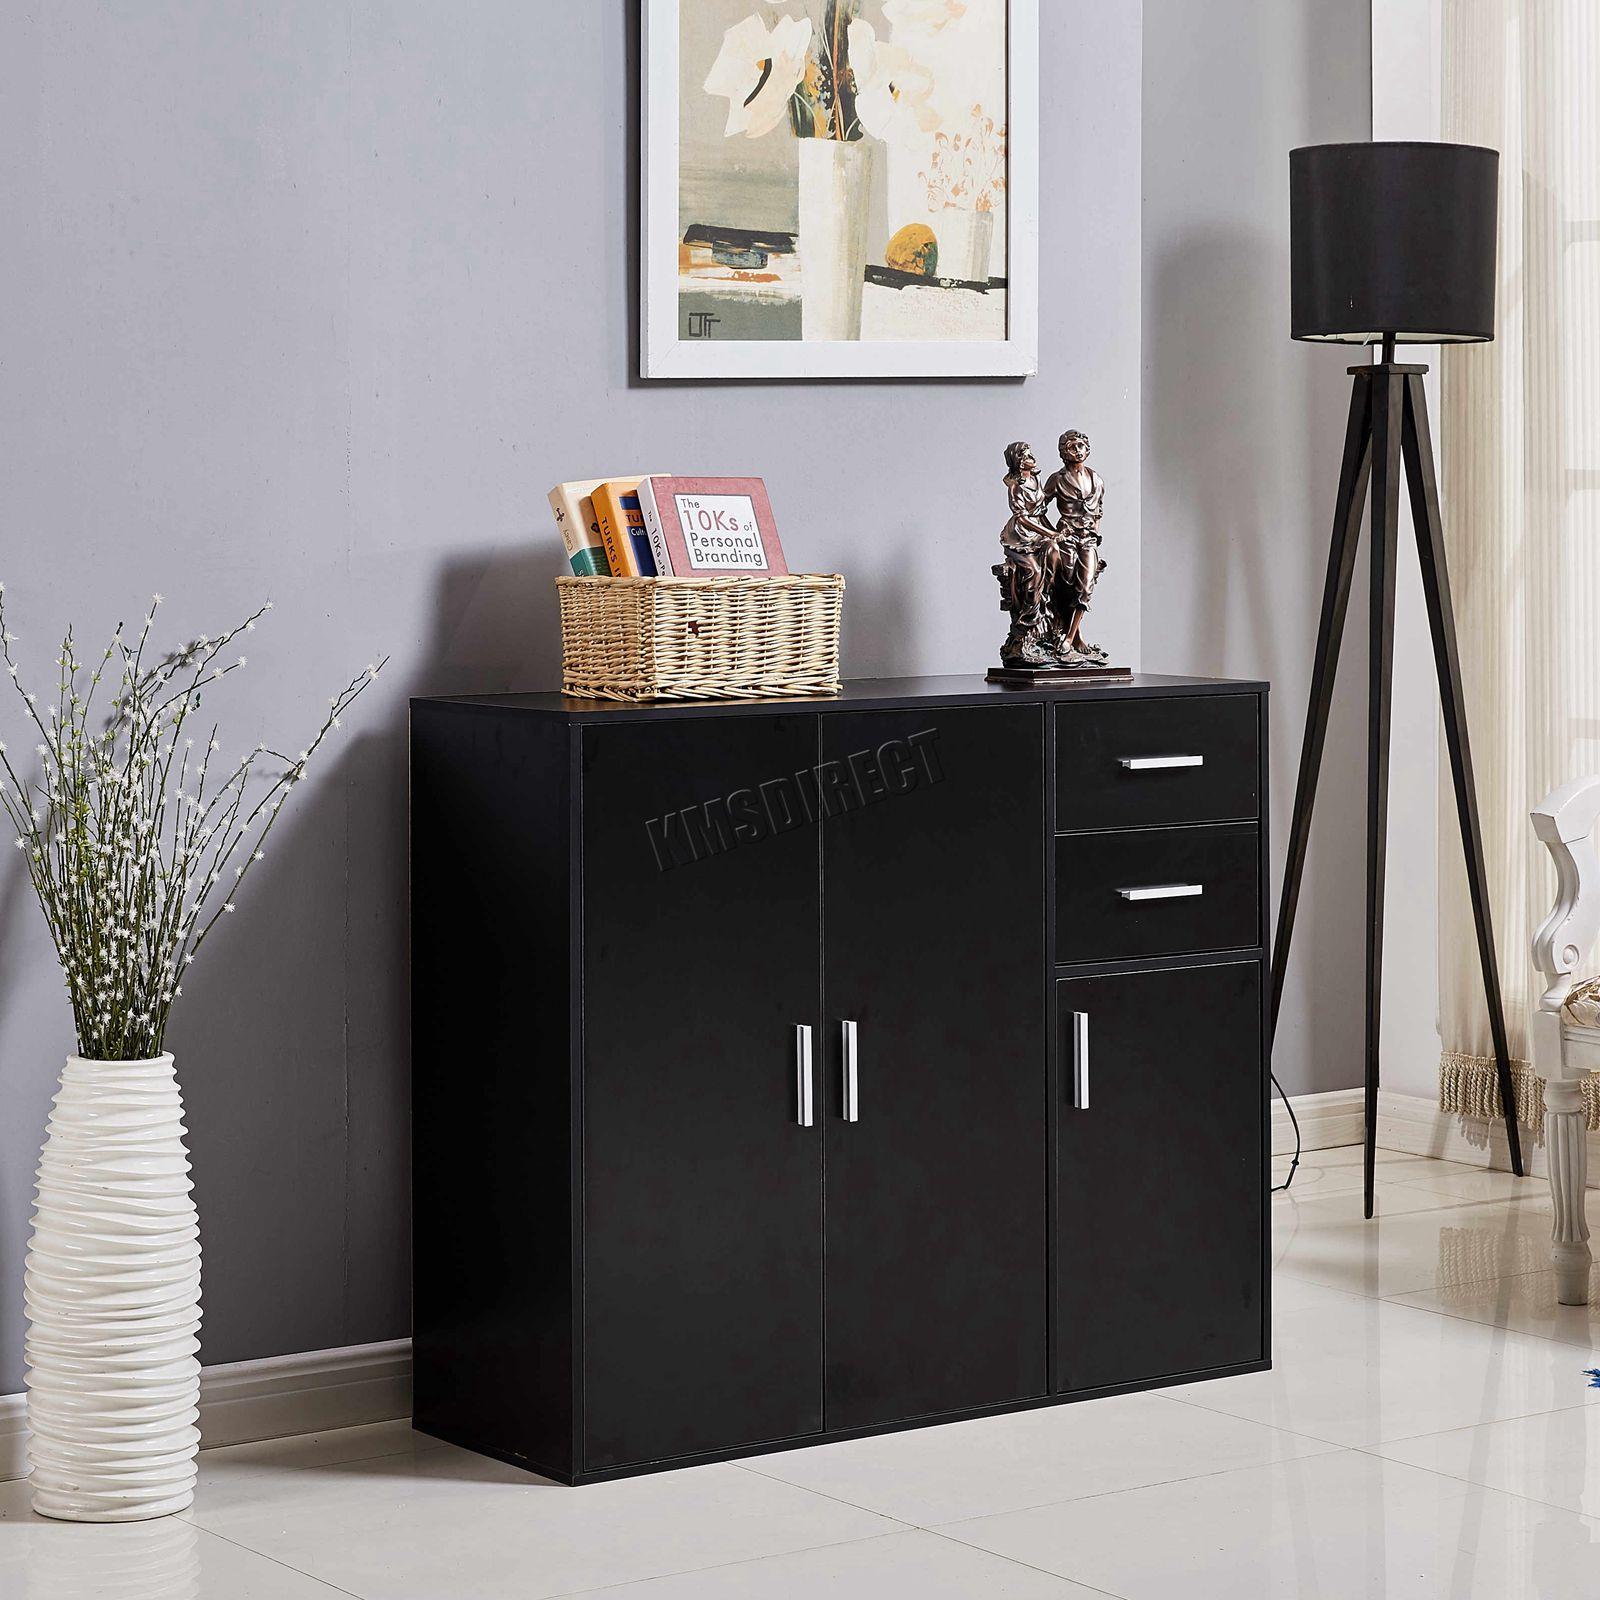 WestWood-Sideboard-Cabinet-Storage-tableware-Kitchen-Cupboard-Unit-PB-SSP01-NEW thumbnail 24